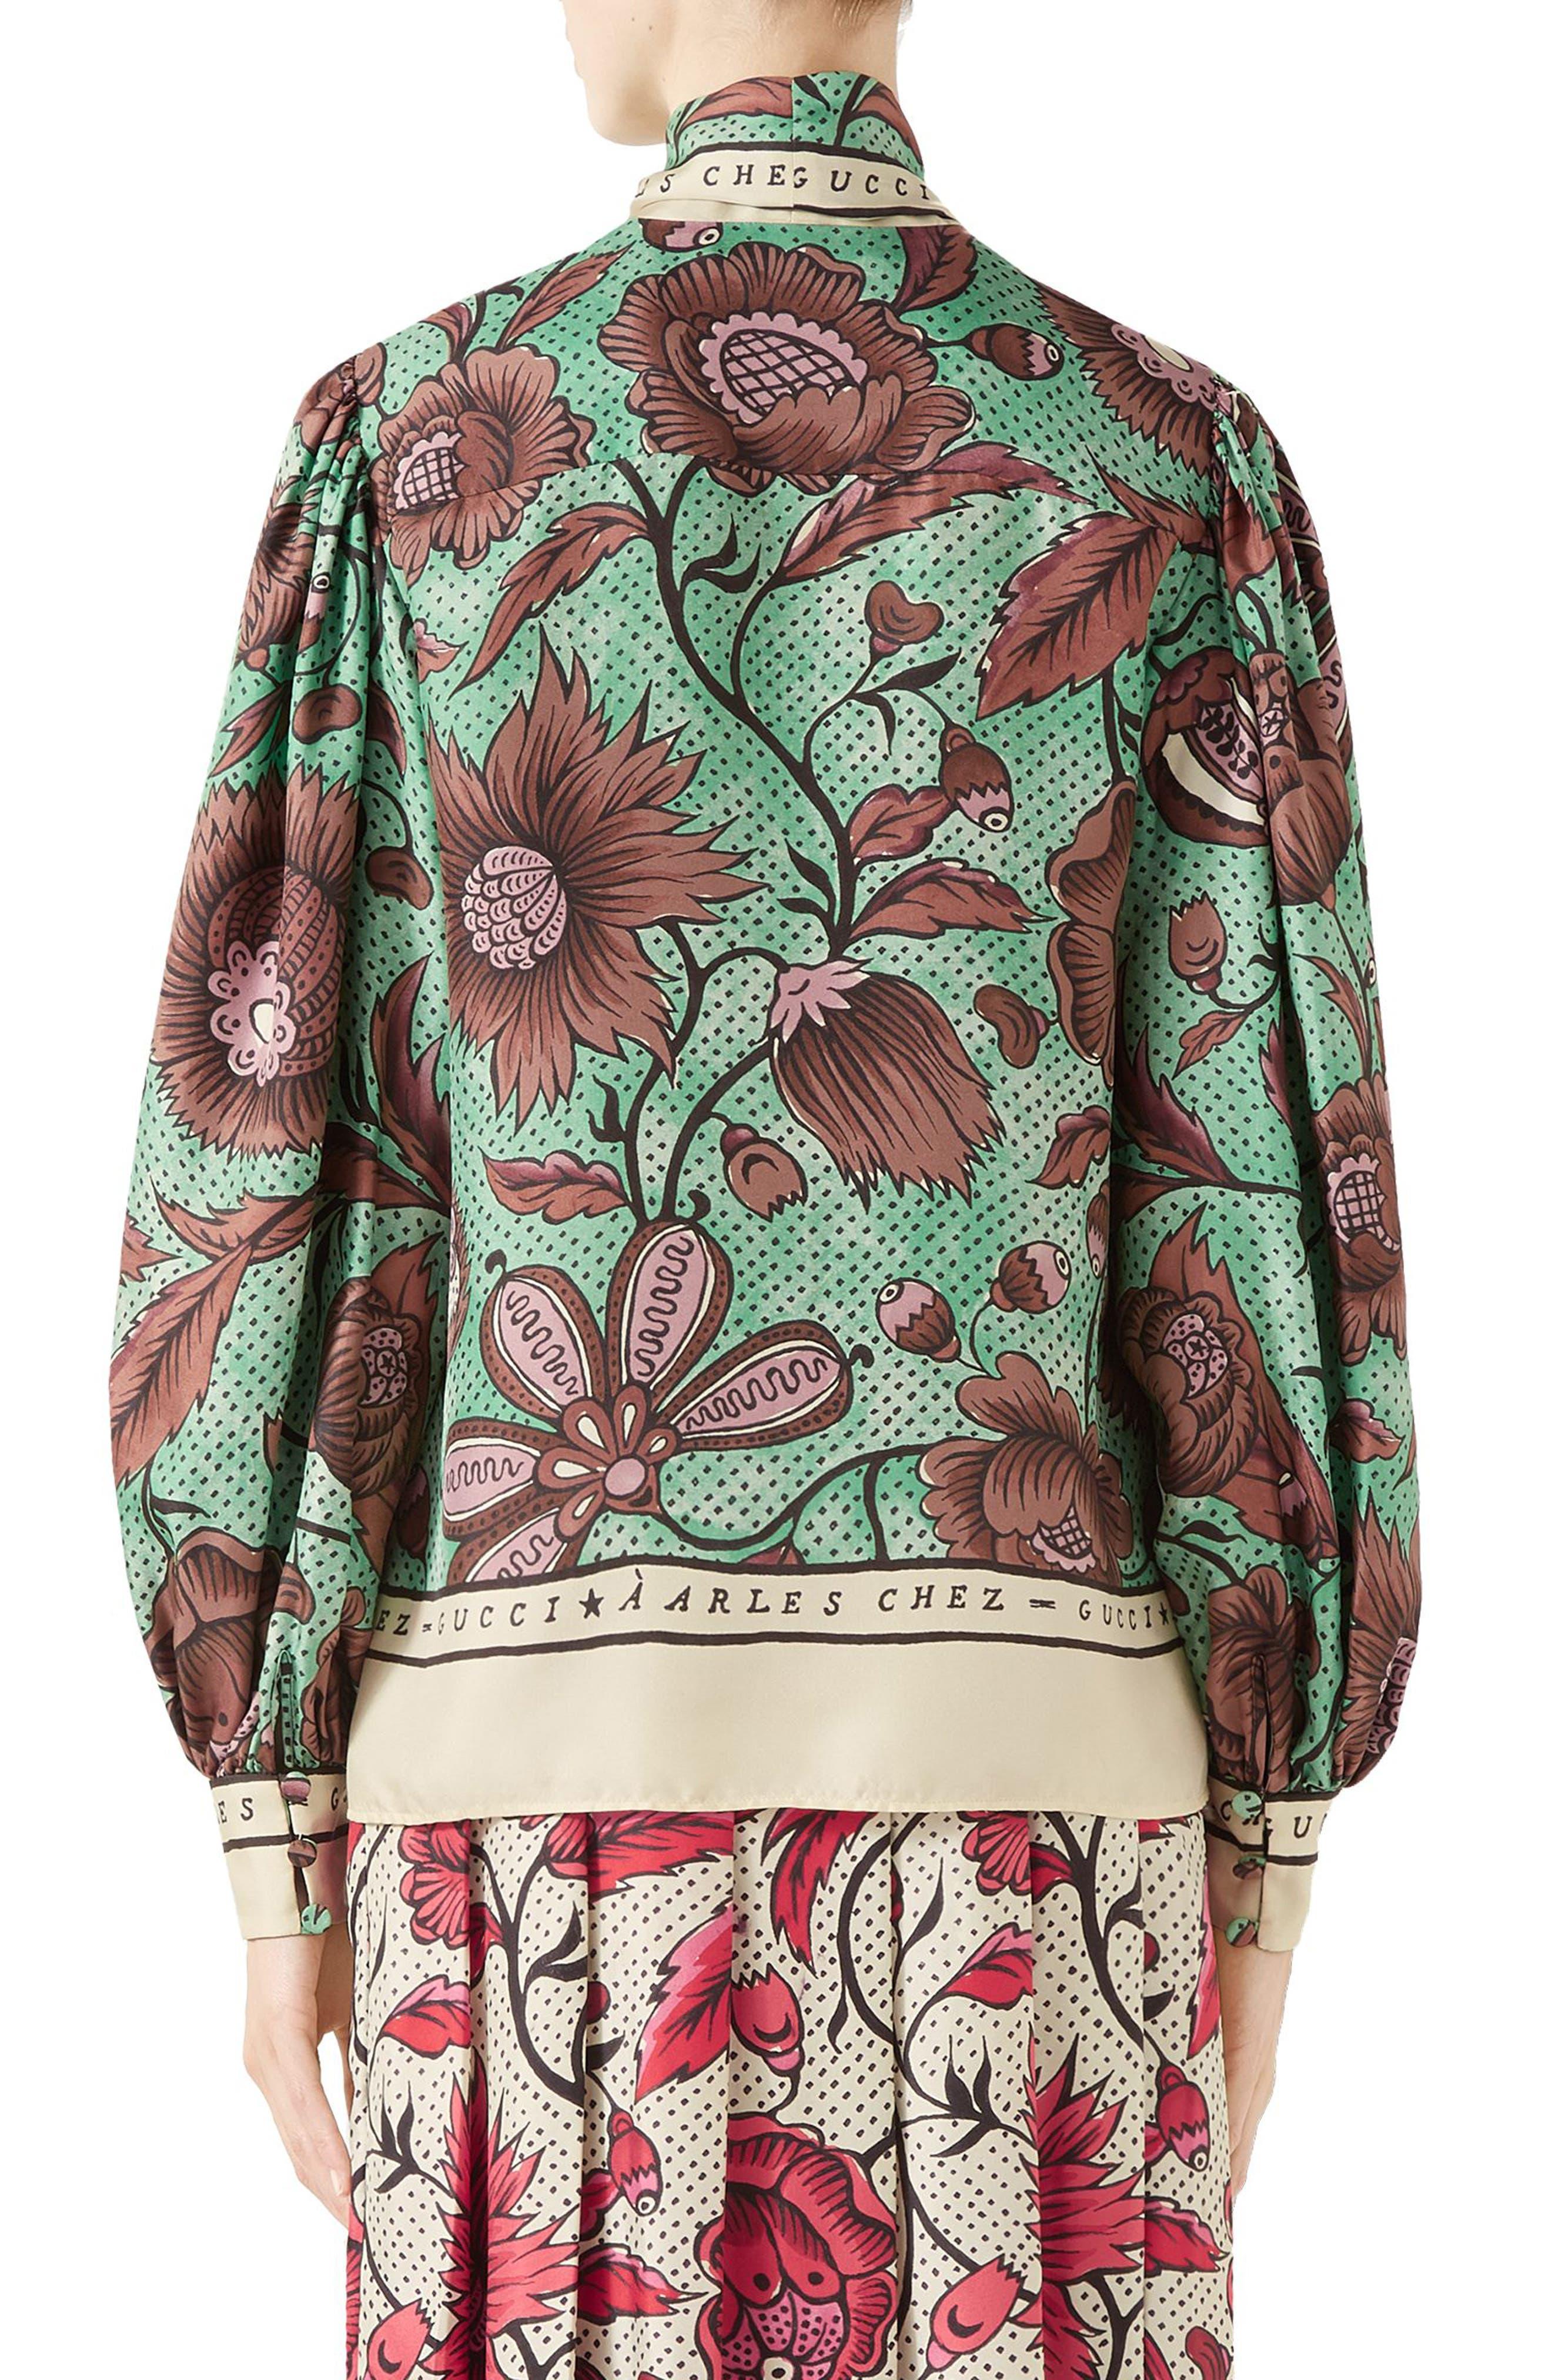 Watercolor Floral Print Tie Neck Silk Blouse,                             Alternate thumbnail 2, color,                             2125 BROWN/ GREEN PRINTED